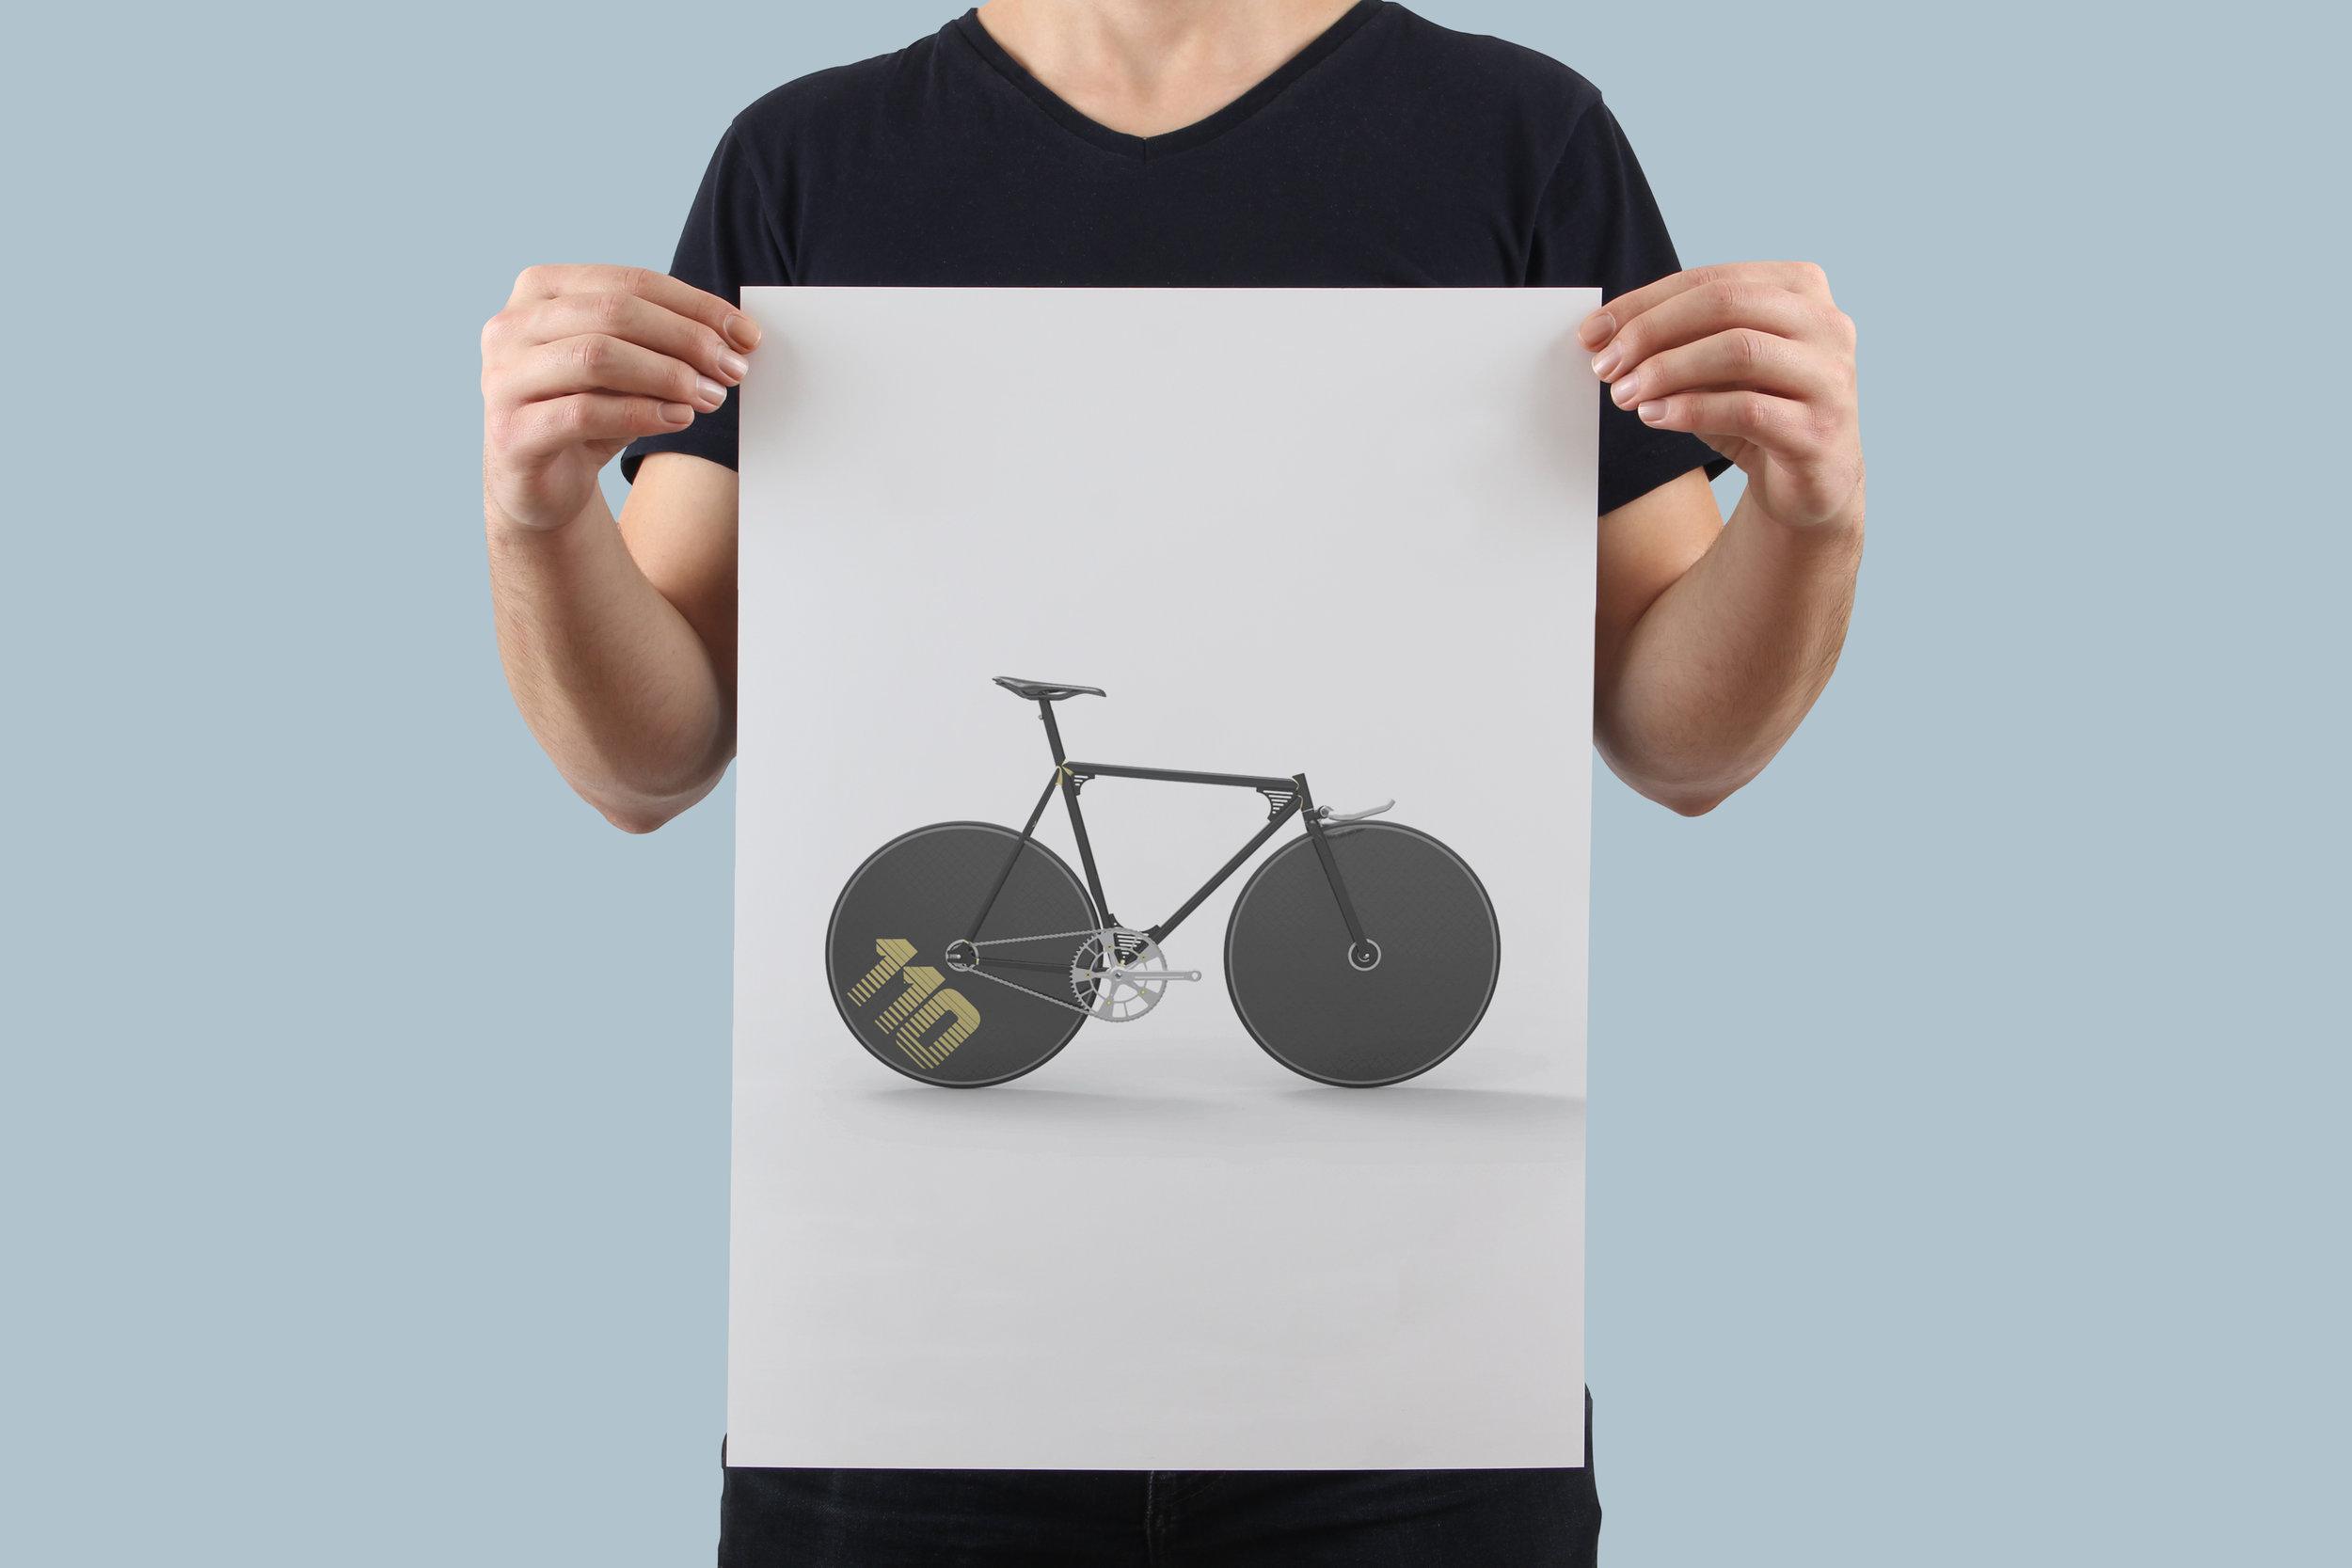 Deco Lo-Pro Pursuit - Limited Edition Print 1 of 20